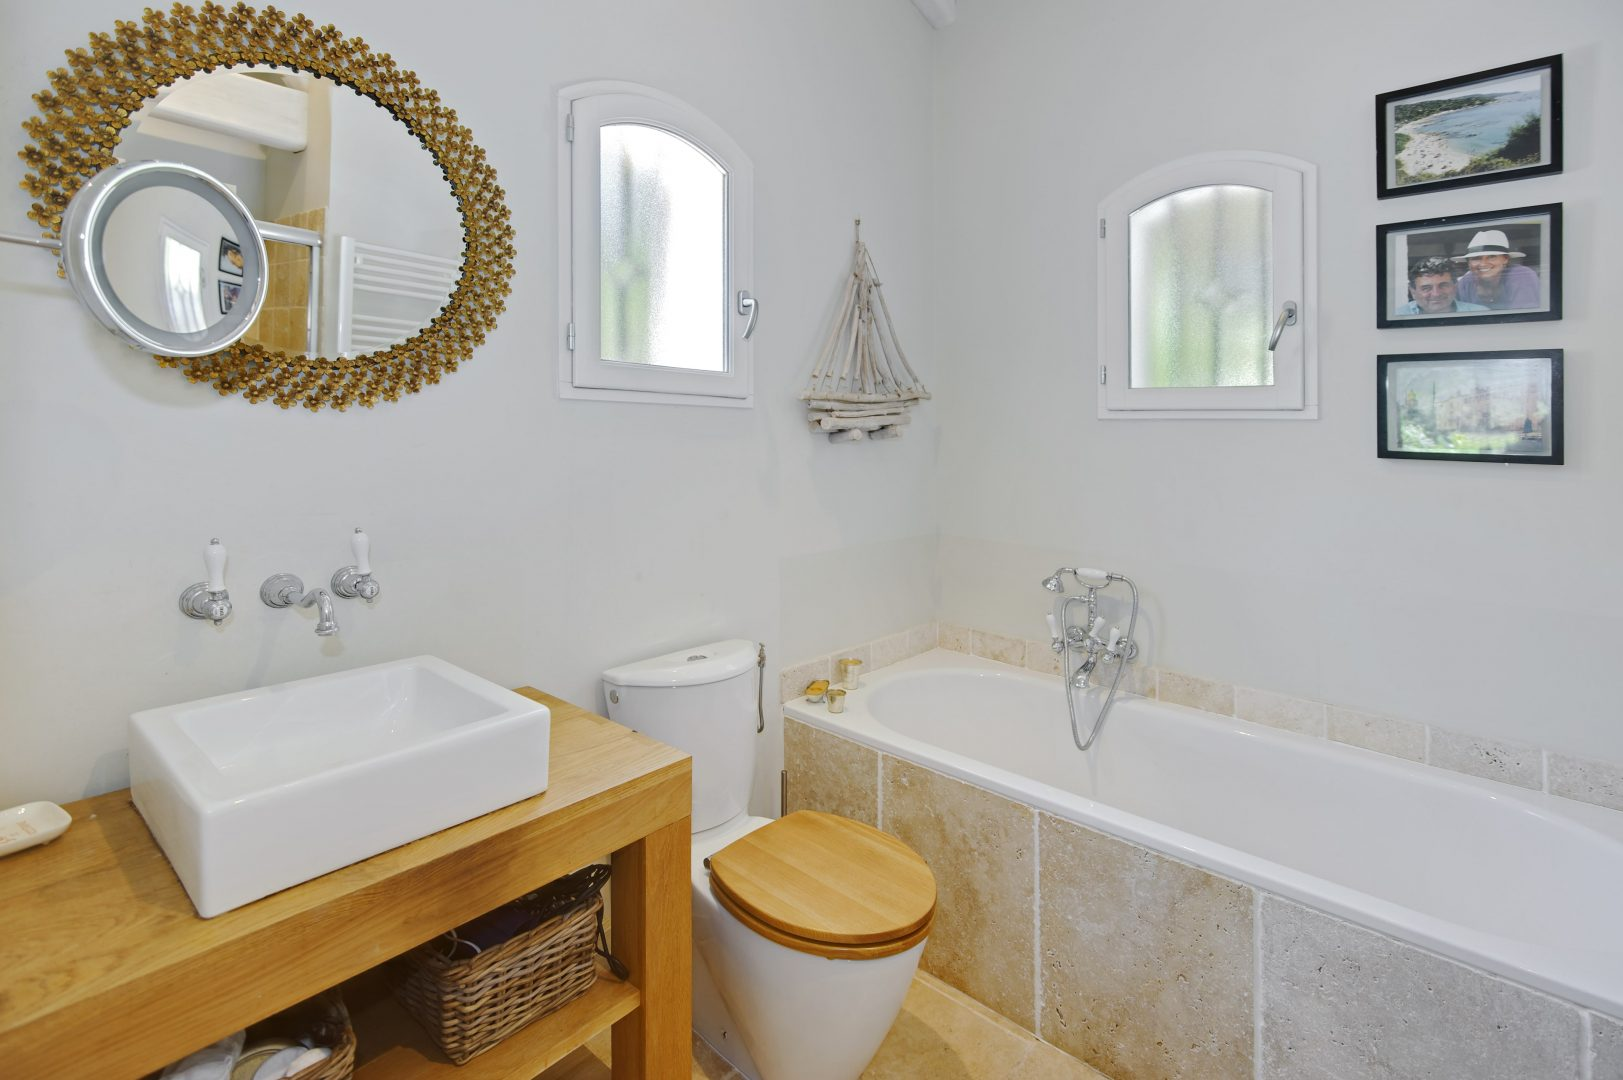 Luxury villa, St. Tropez, sleeps 8, private pool, air conditioning, walk to beach